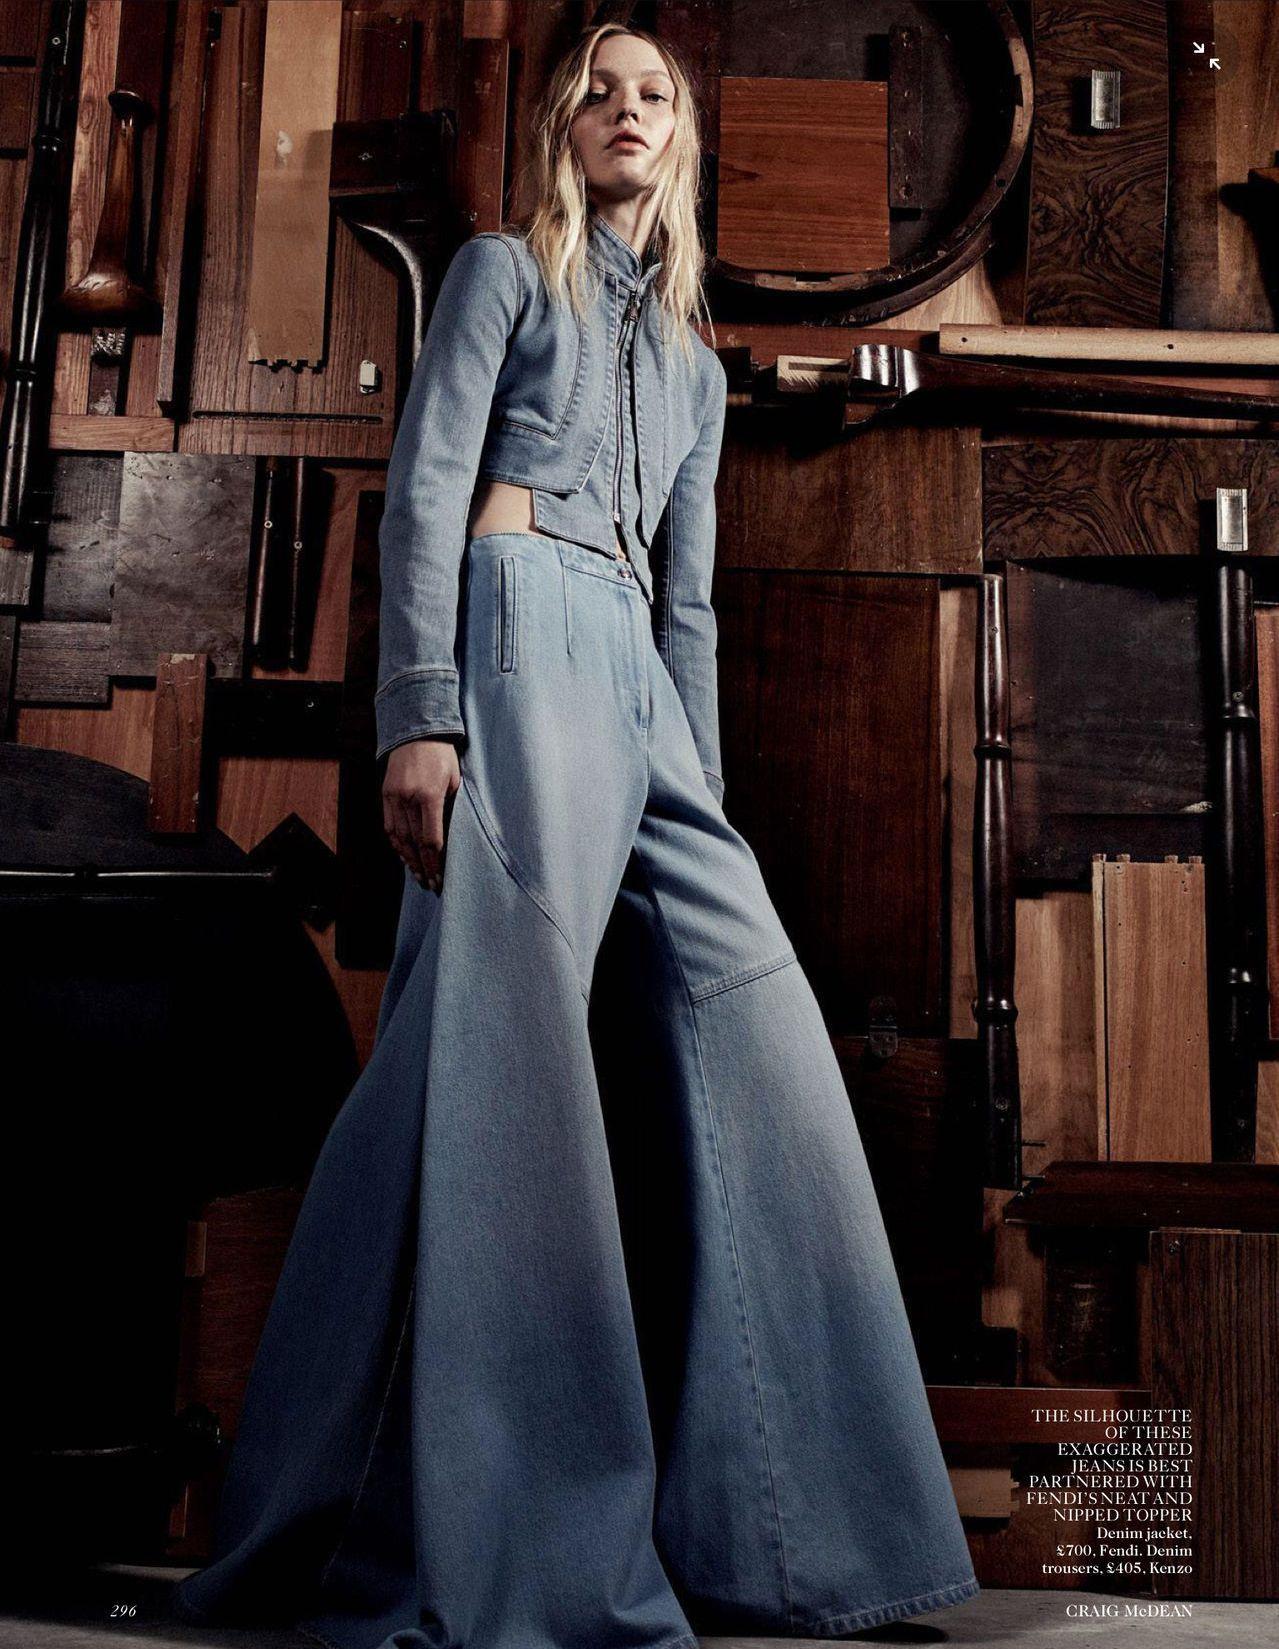 Designer Denim: Fendi Denim Jacket | Kenzo Denim Pants | Sasha Pivovarova by Craig McDean for Vogue UK, March 2015